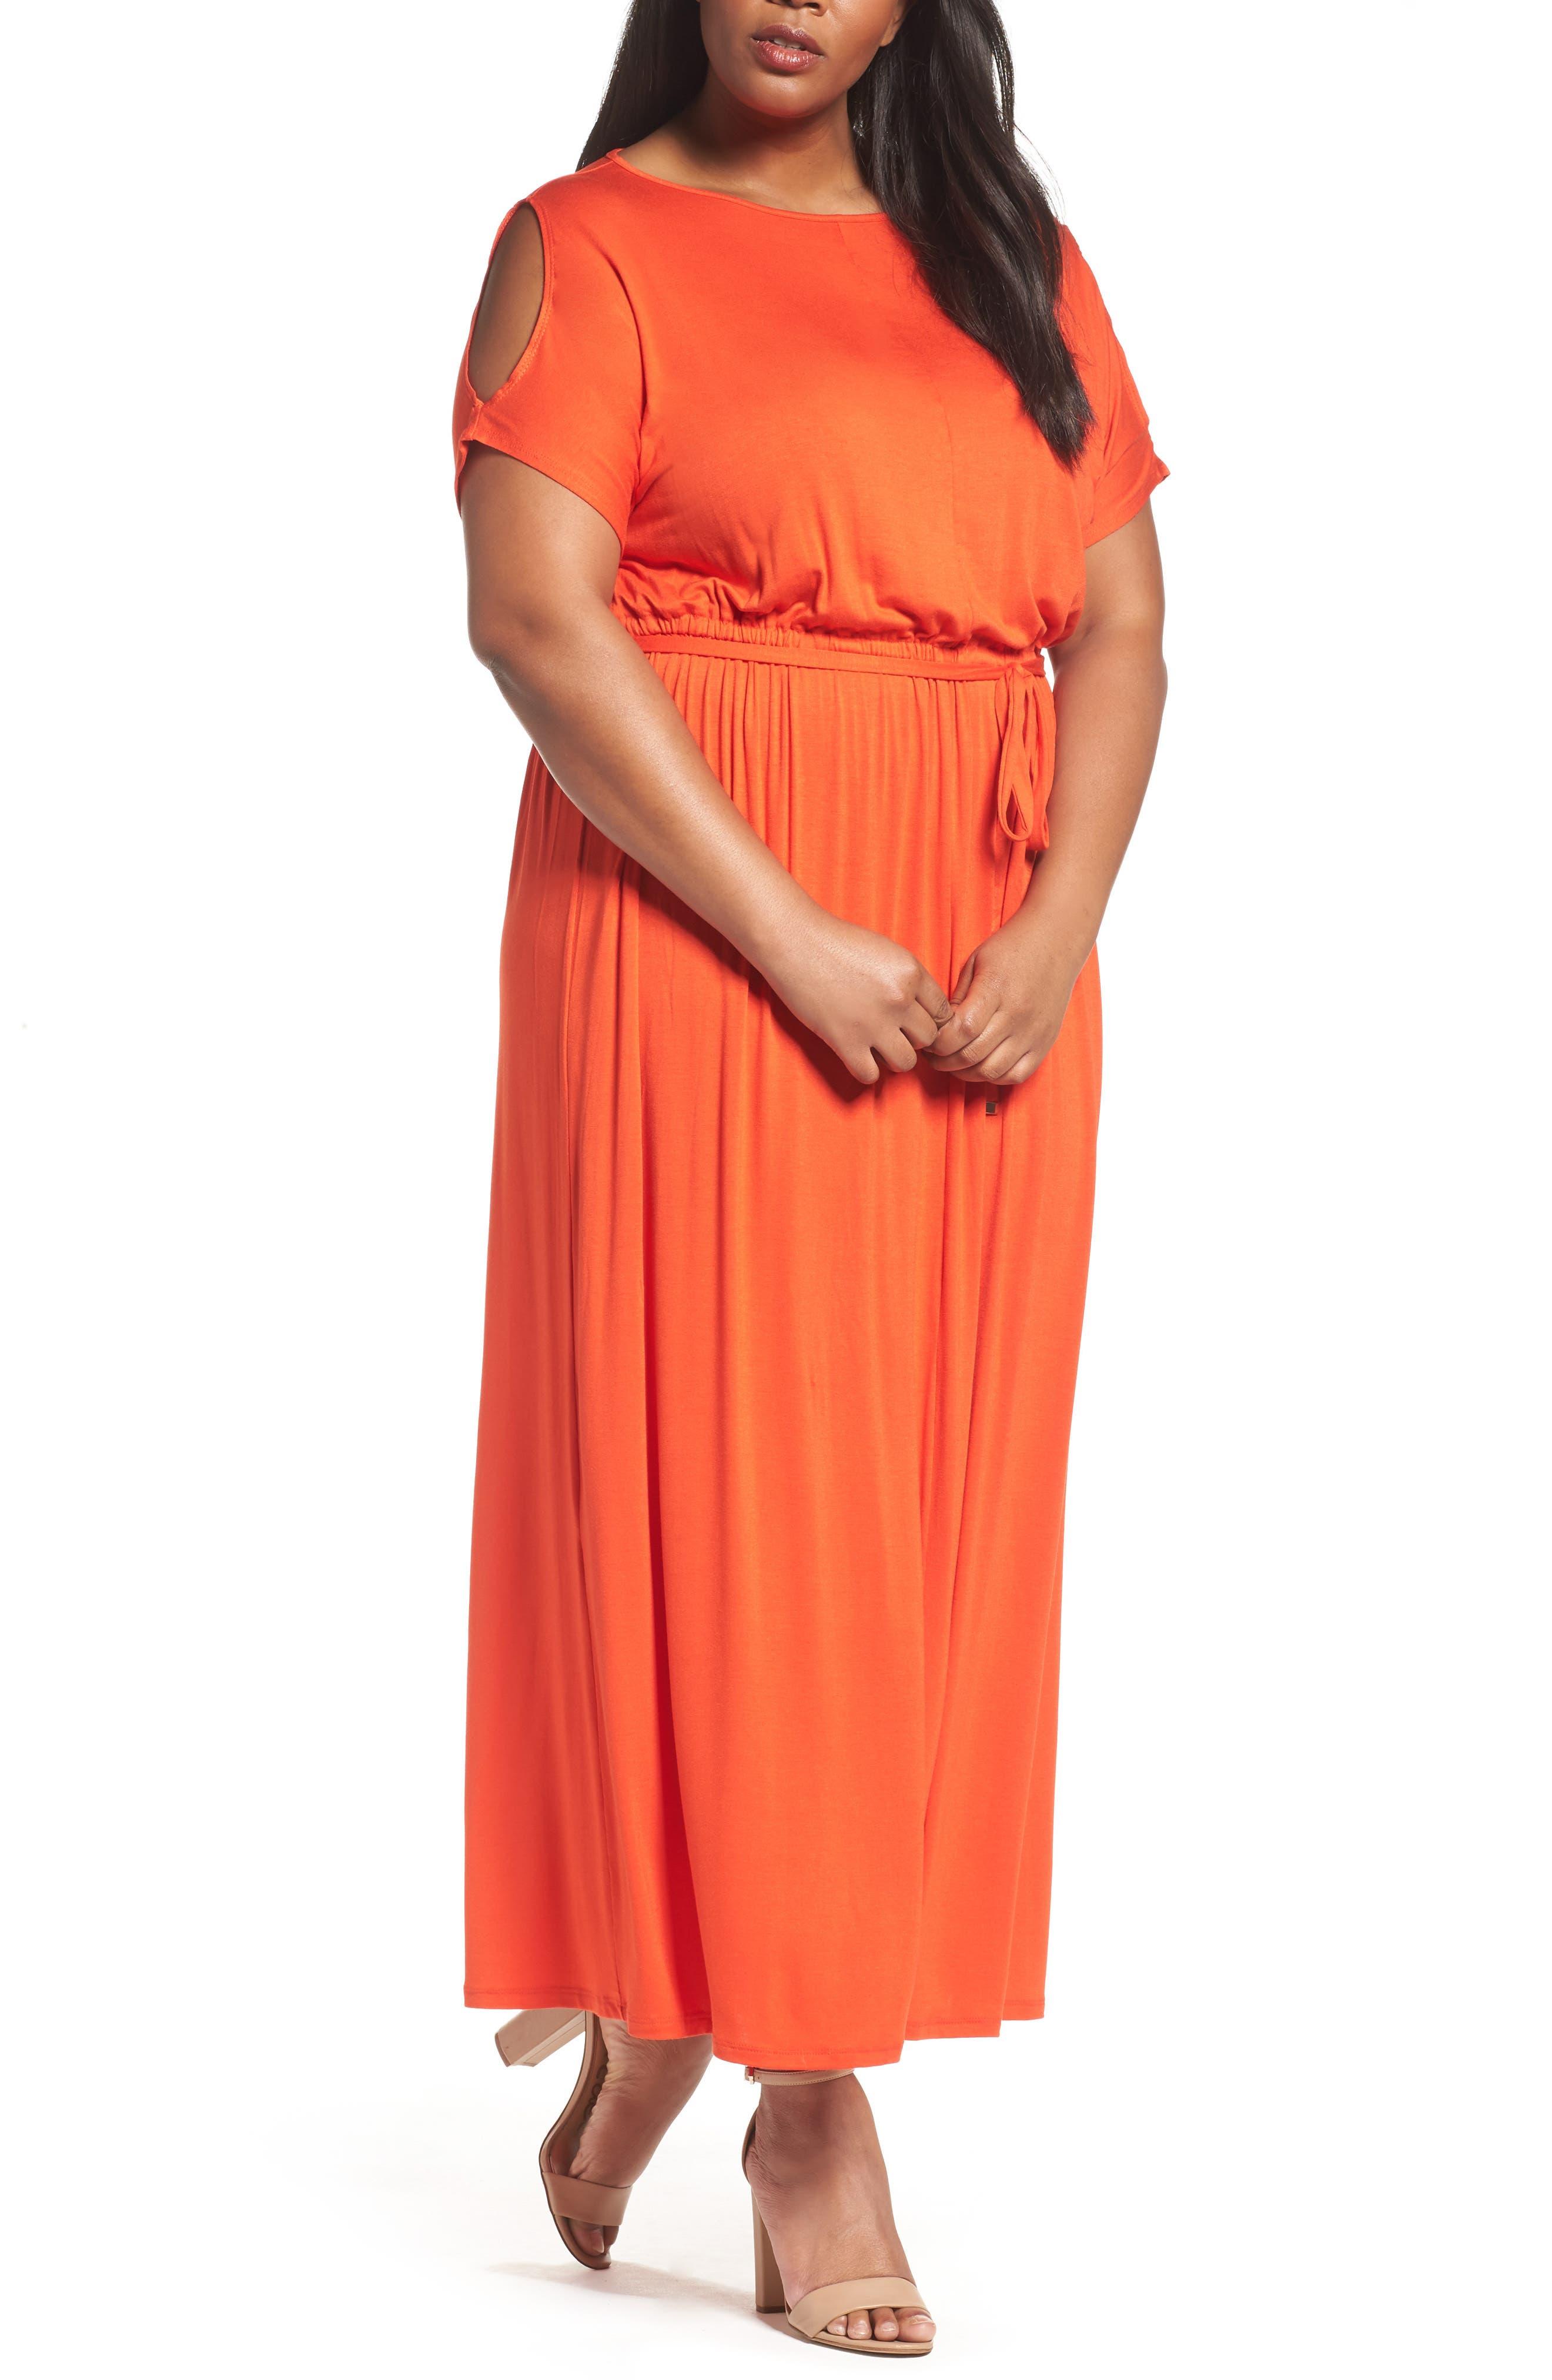 Alternate Image 1 Selected - Dorothy Perkins Jersey Cold Shoulder Maxi Dress (Plus Size)